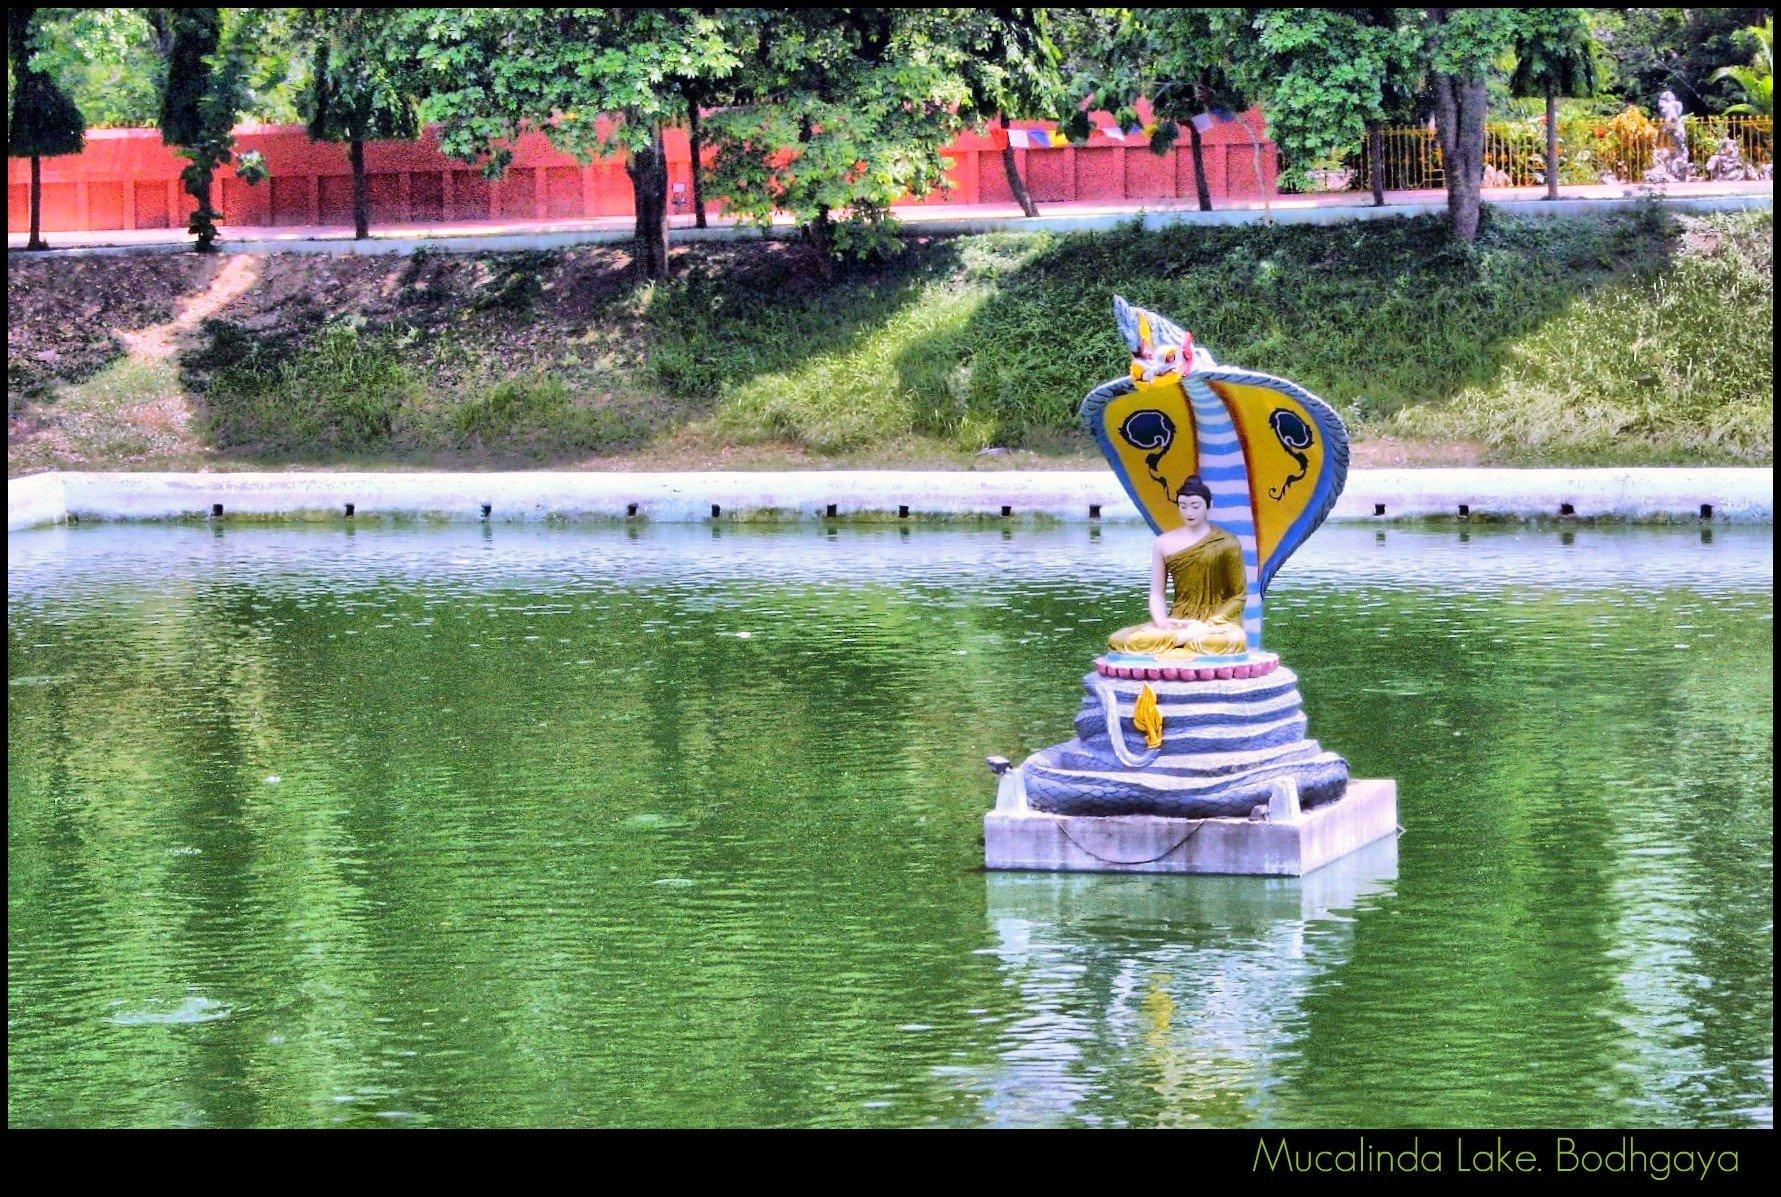 Heavenly Bodh Gaya: The Land Of Inner Purification In 2020 5